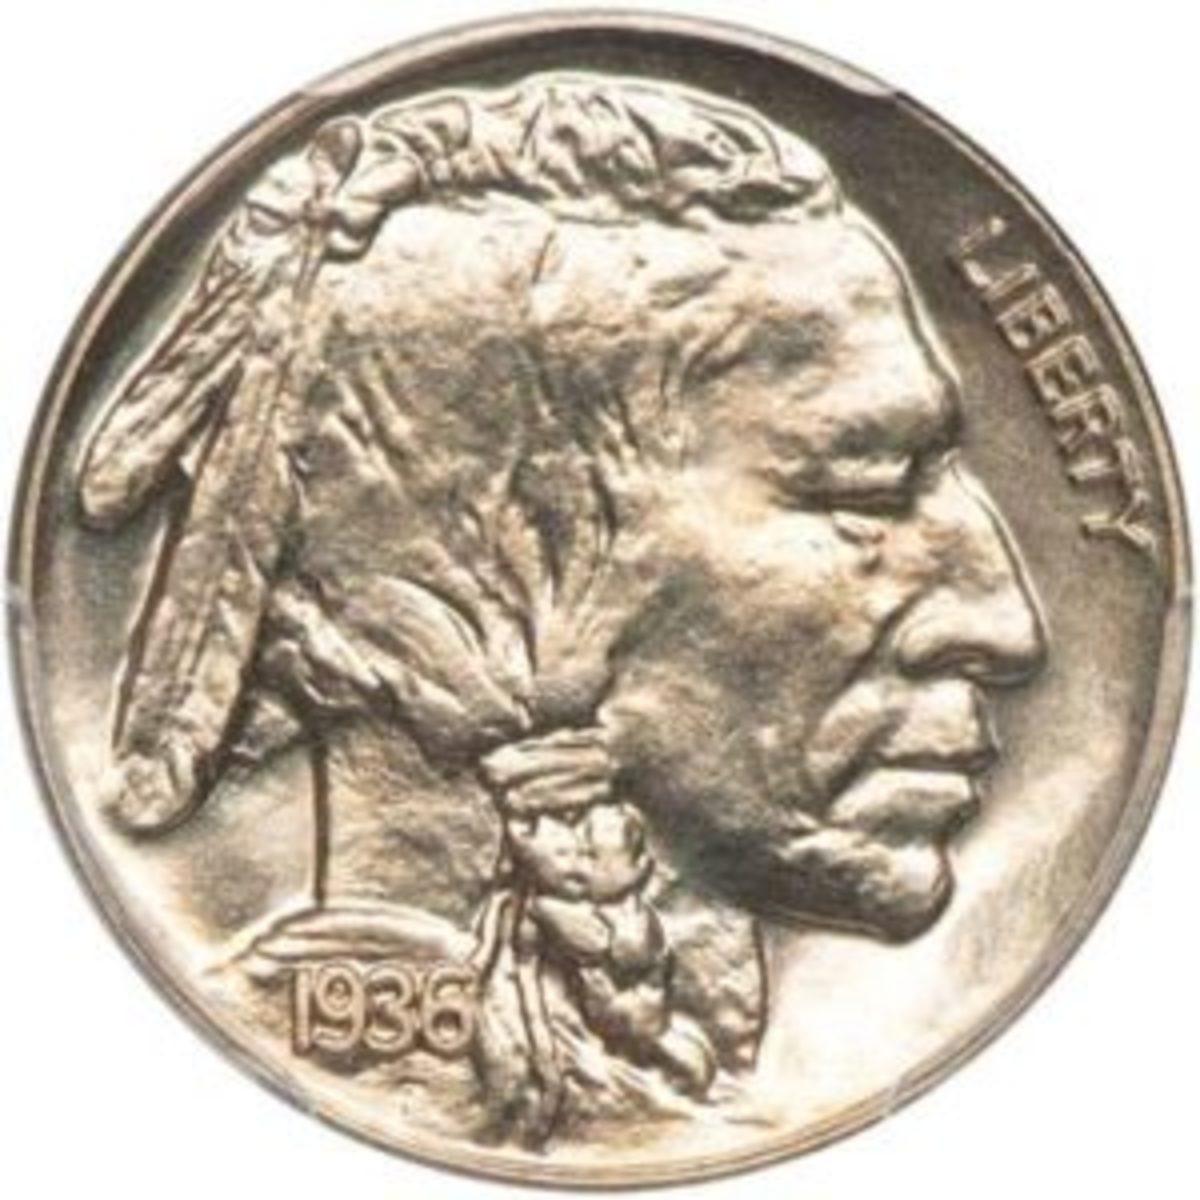 1936 GEM Satin Proof Buffalo Nickel,